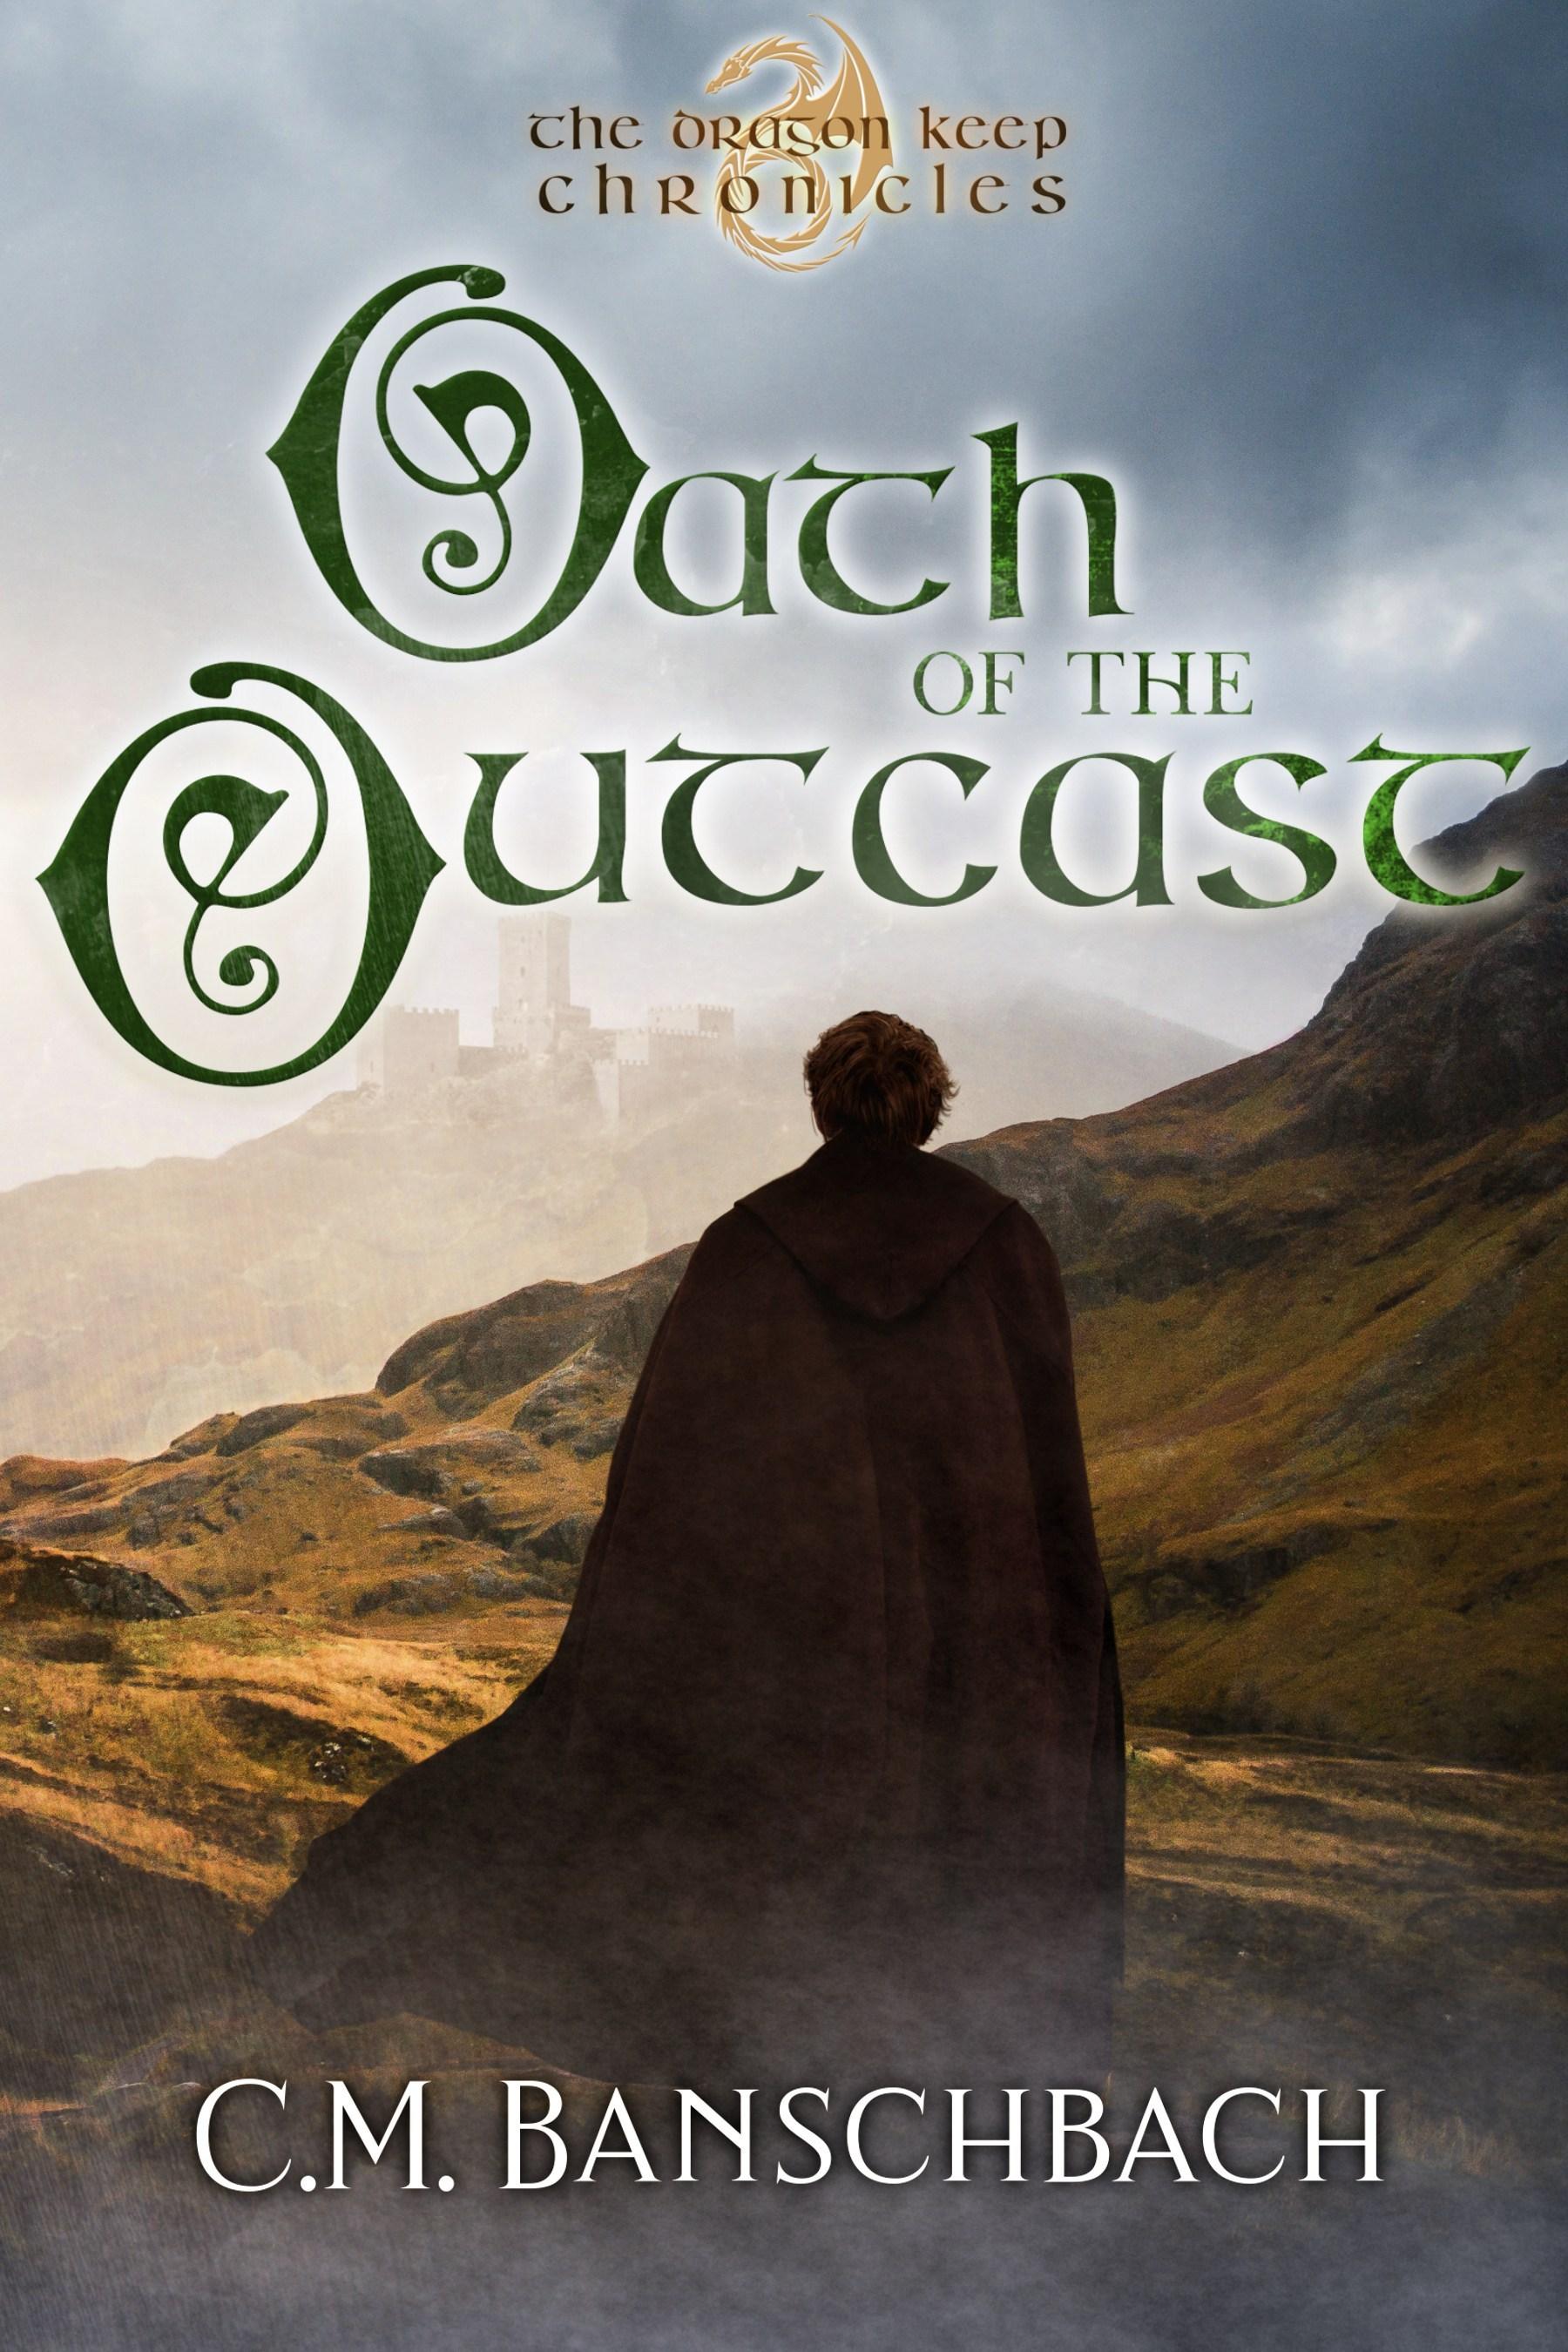 Oath-of-the-Outcast